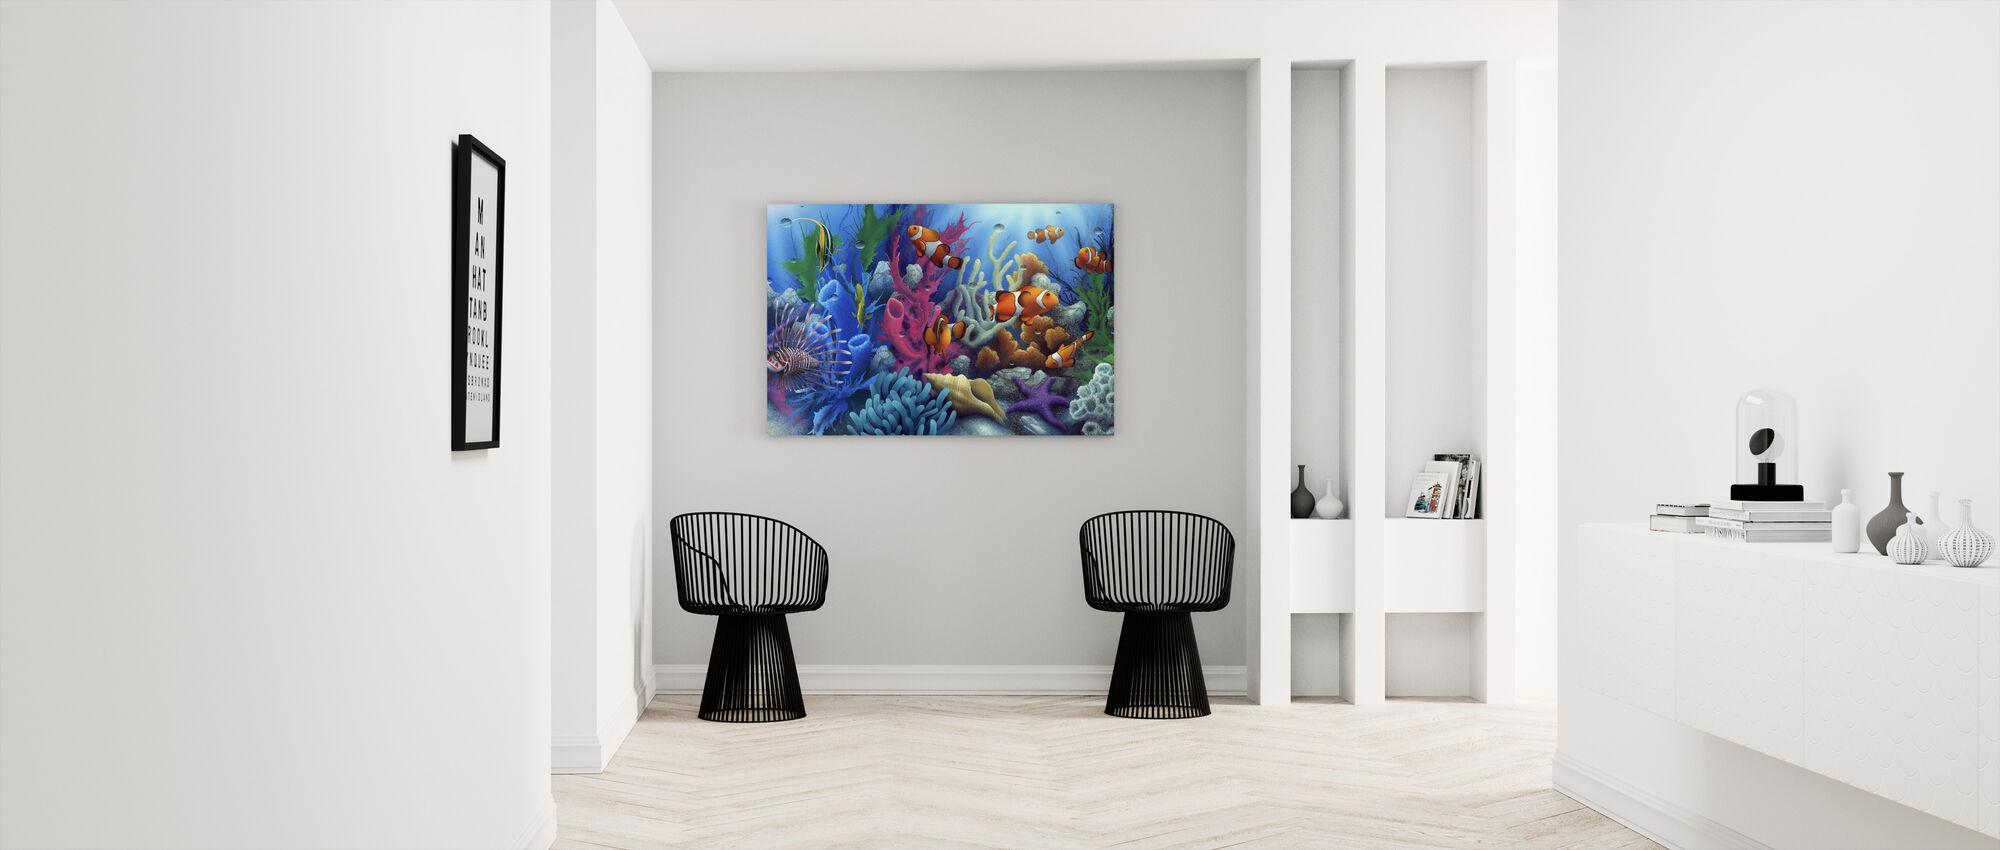 Around The World 2 - Canvas print - Hallway